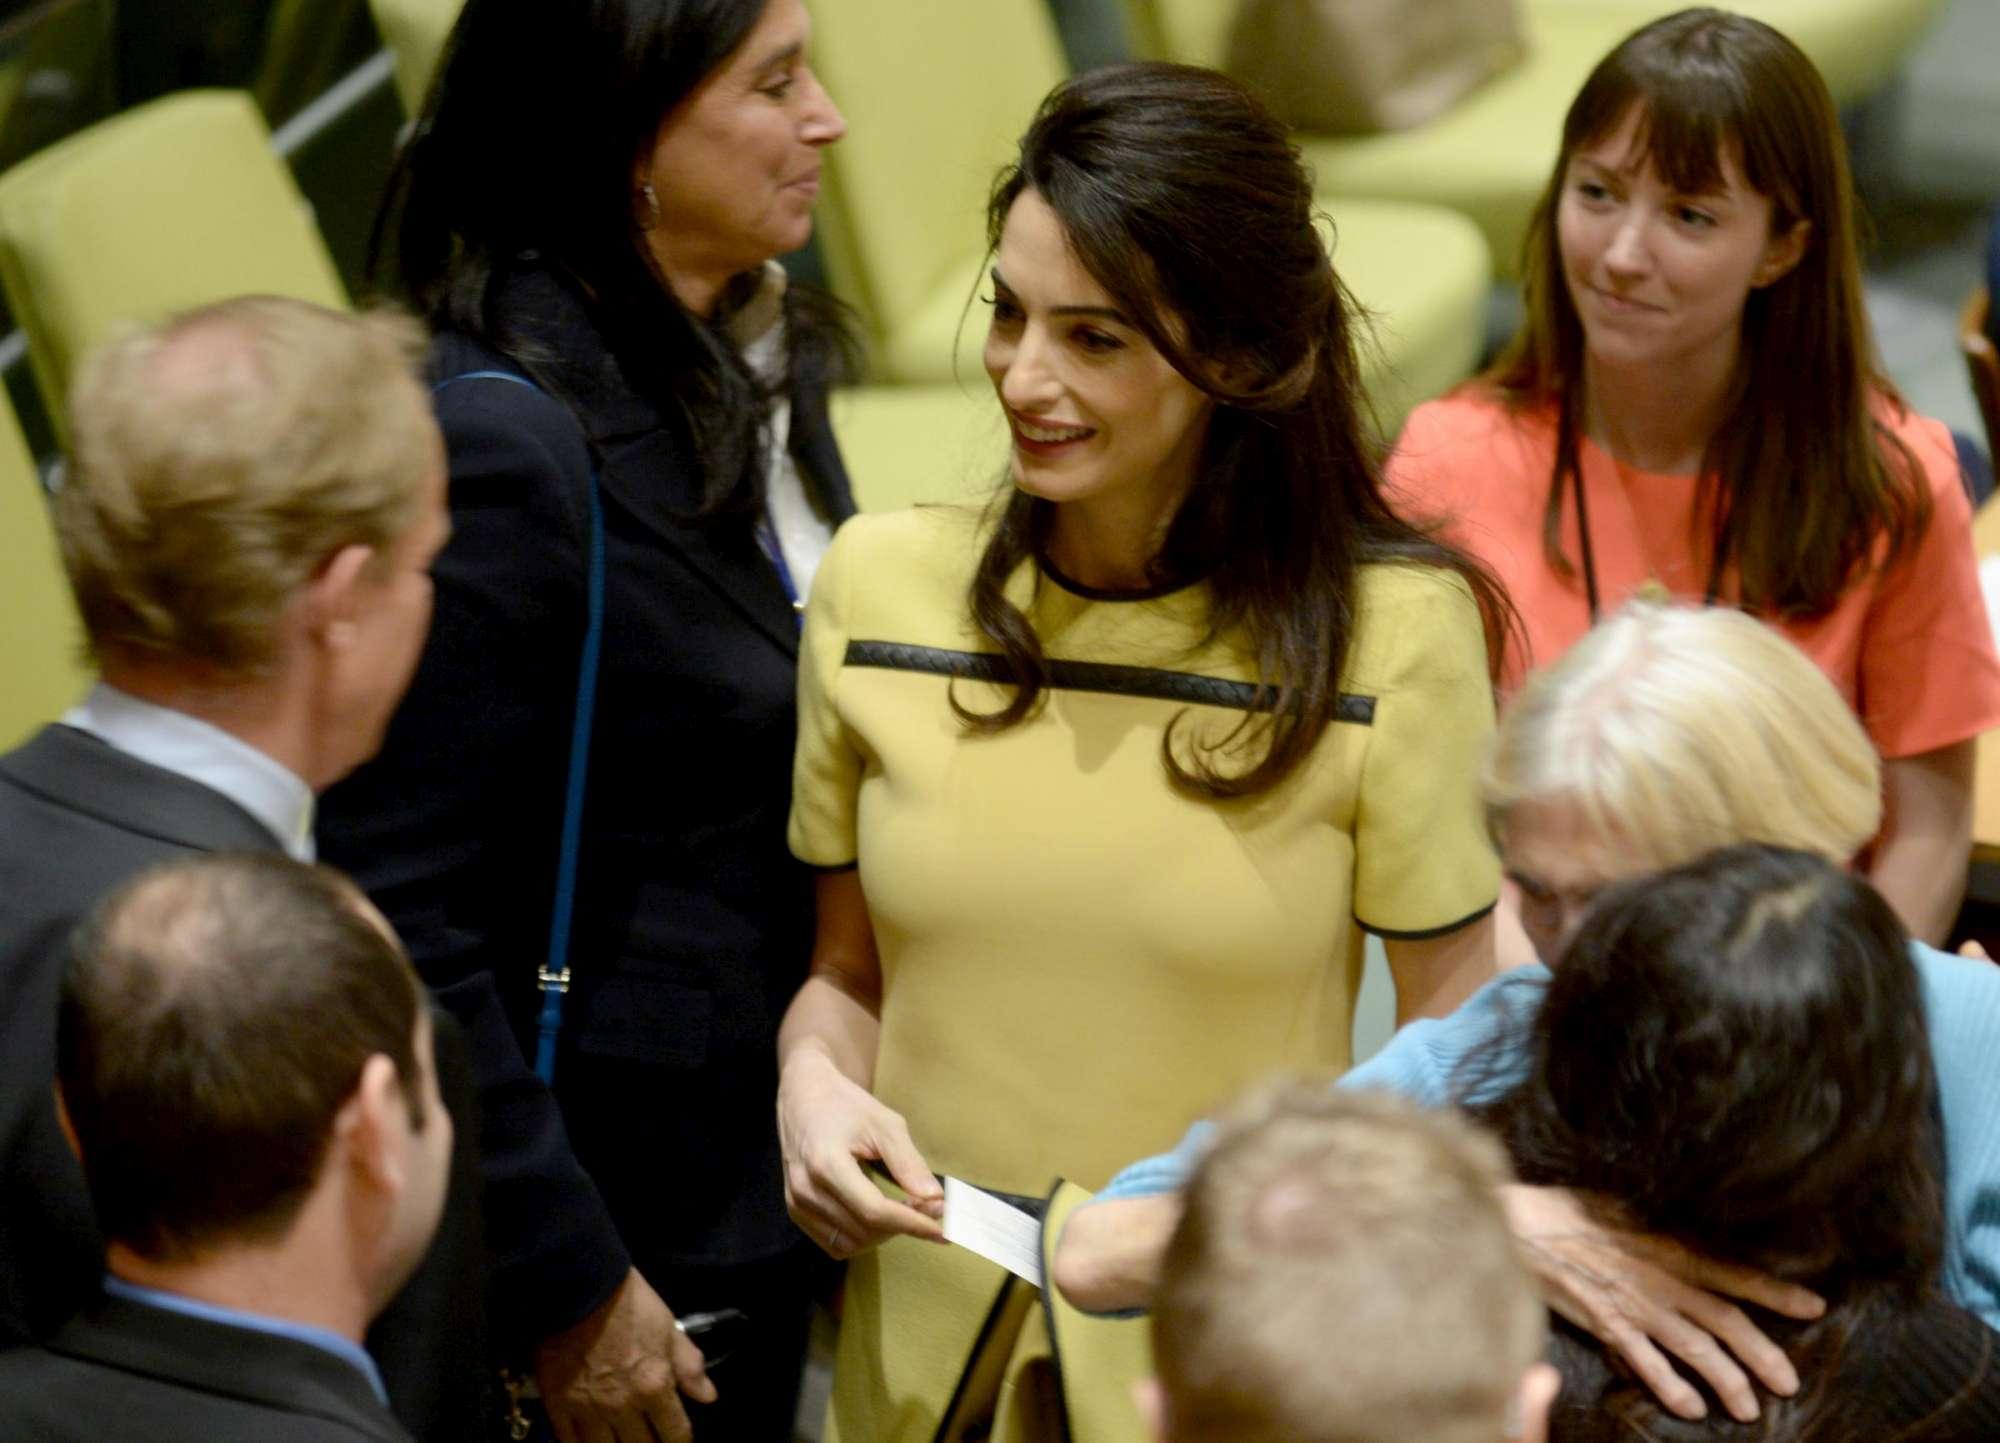 Amal Clooney regina (con pancetta) alle Nazioni Unite